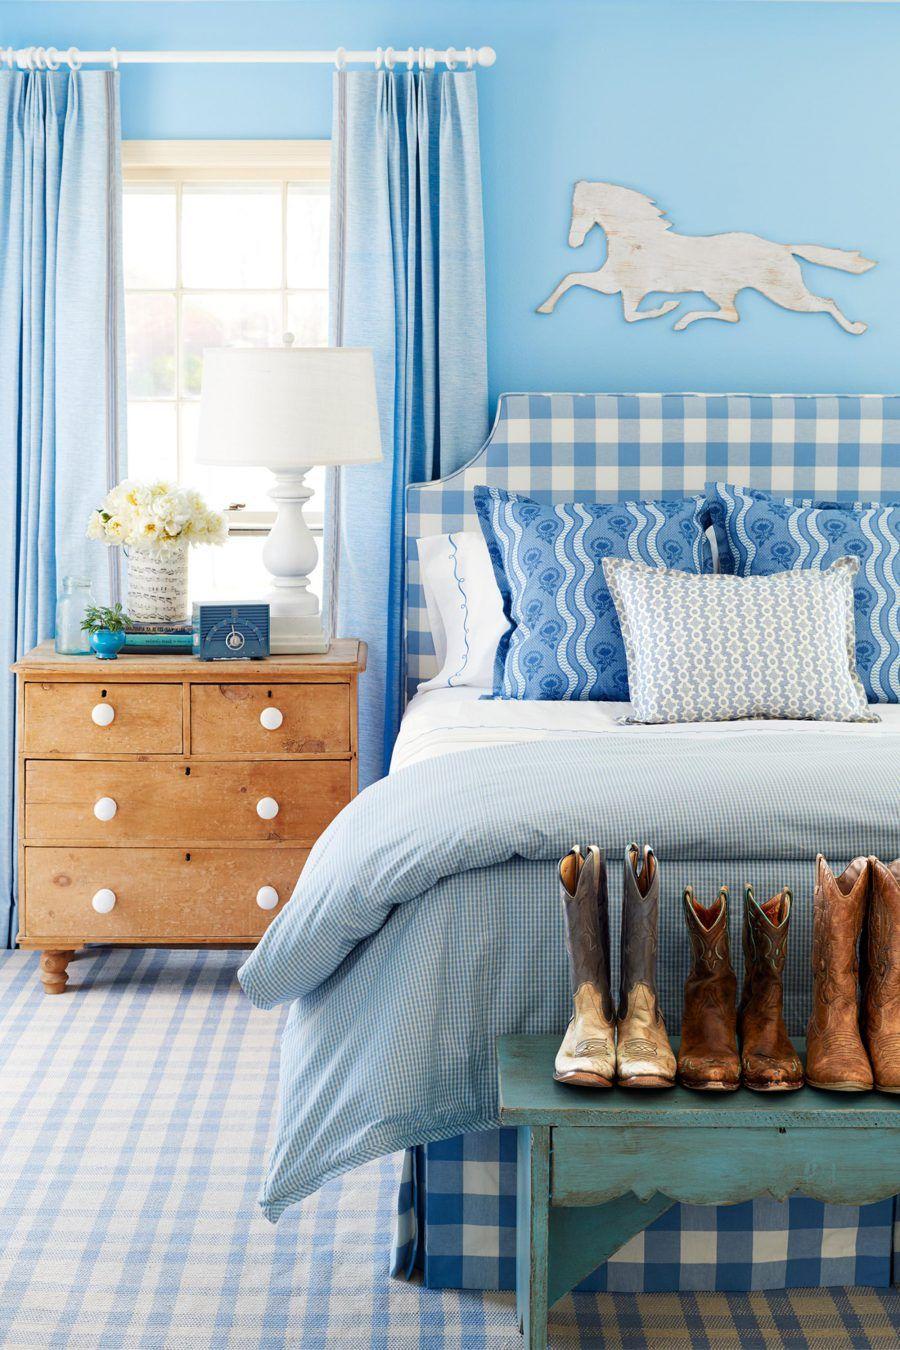 30 Best Vintage Bedroom Decor Ideas Interiorsherpa Bedroom Vintage Bedroom Decor Blue Bedroom Colors